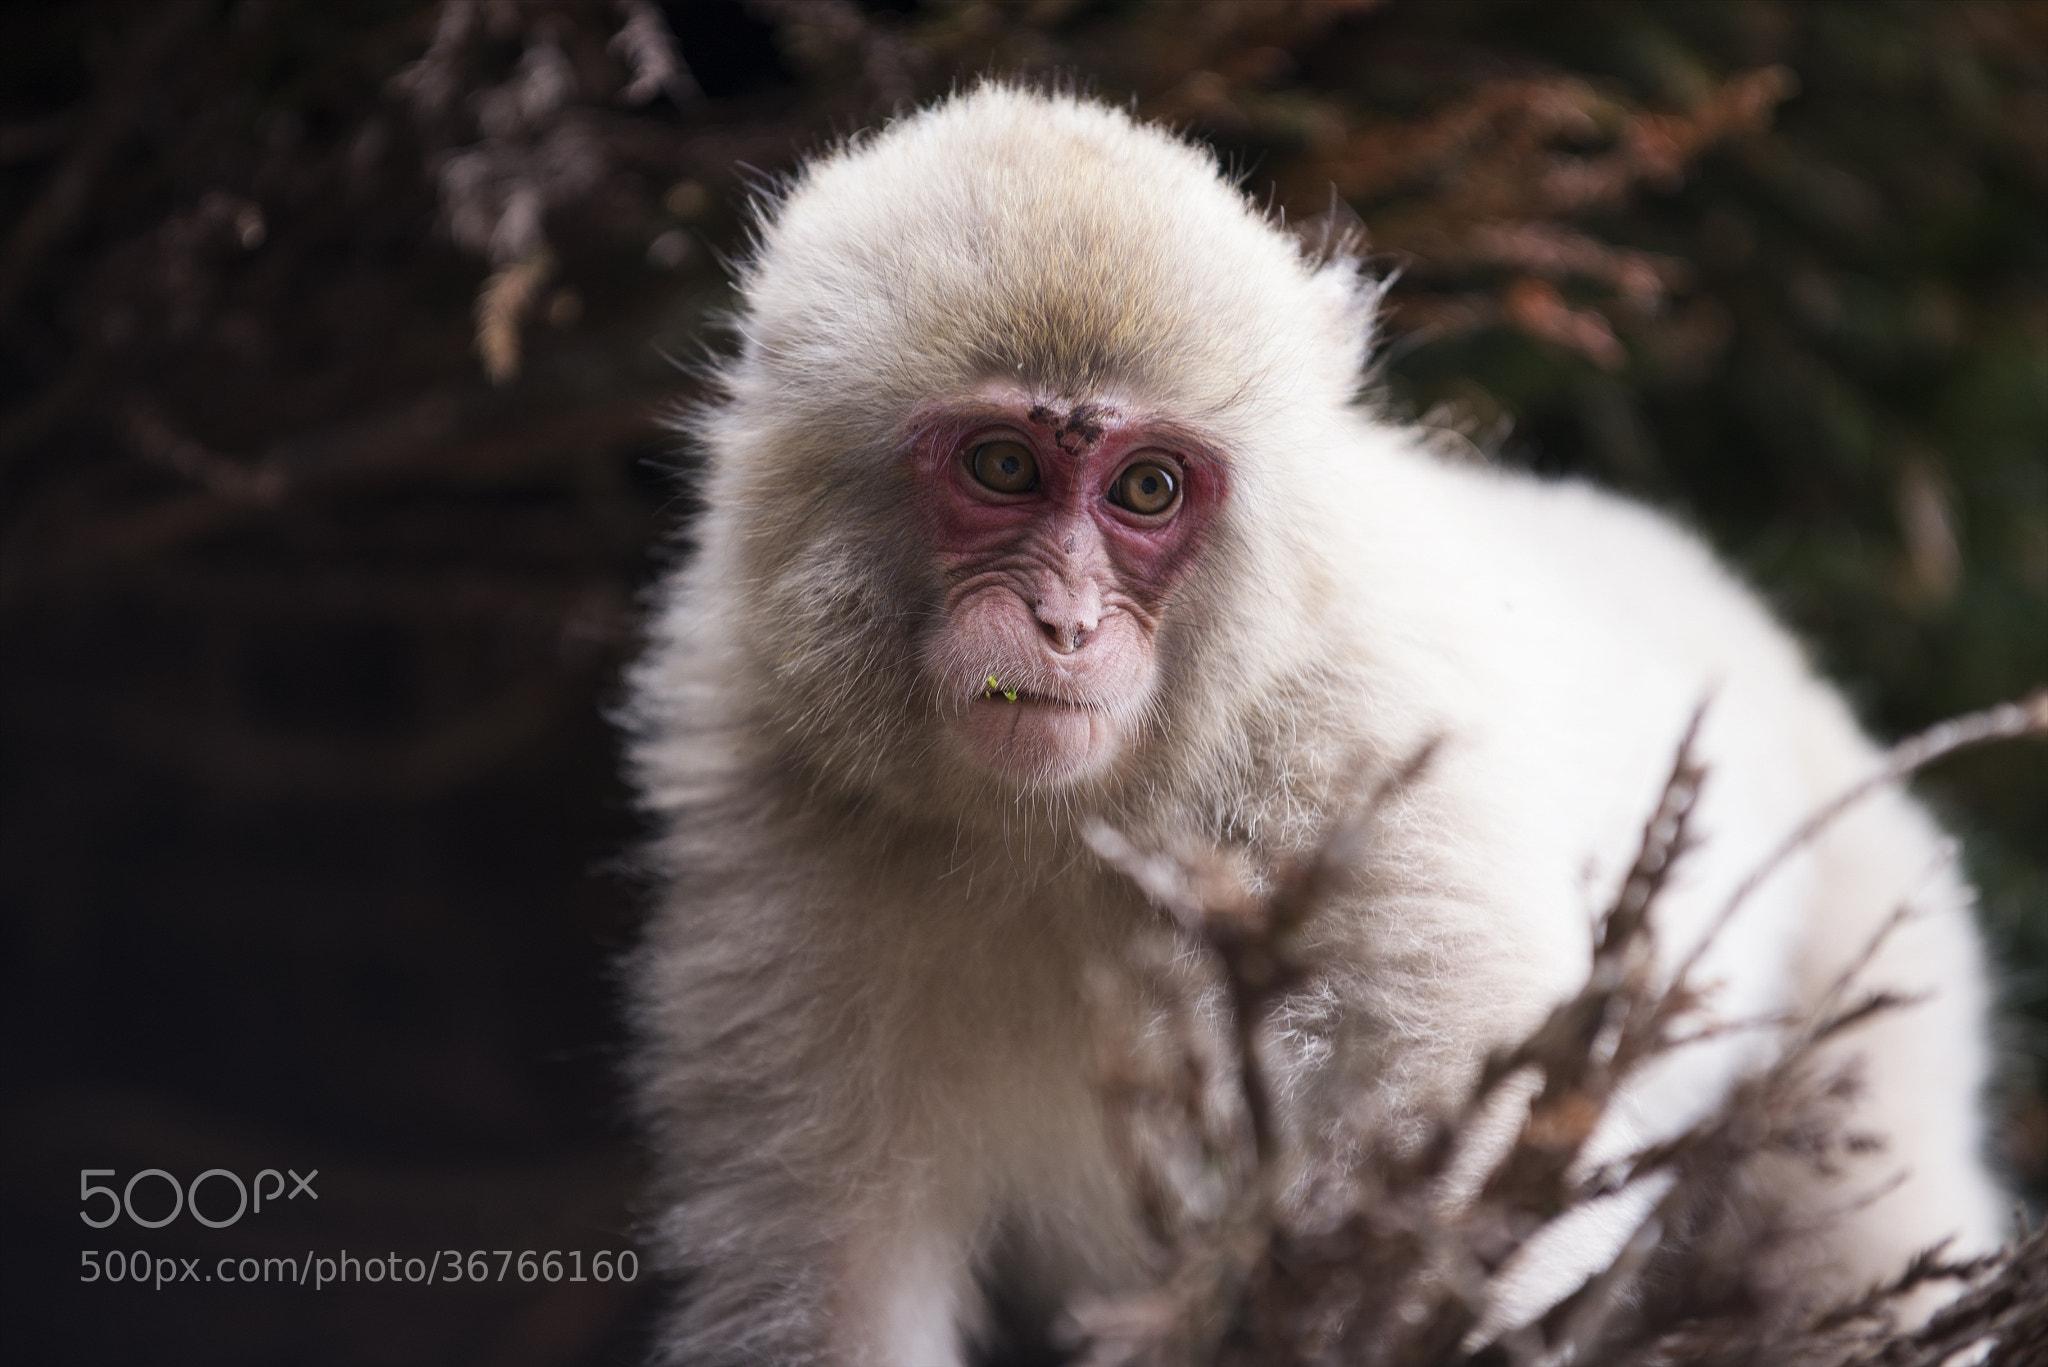 Photograph A lonely monkey by hugh dornan on 500px